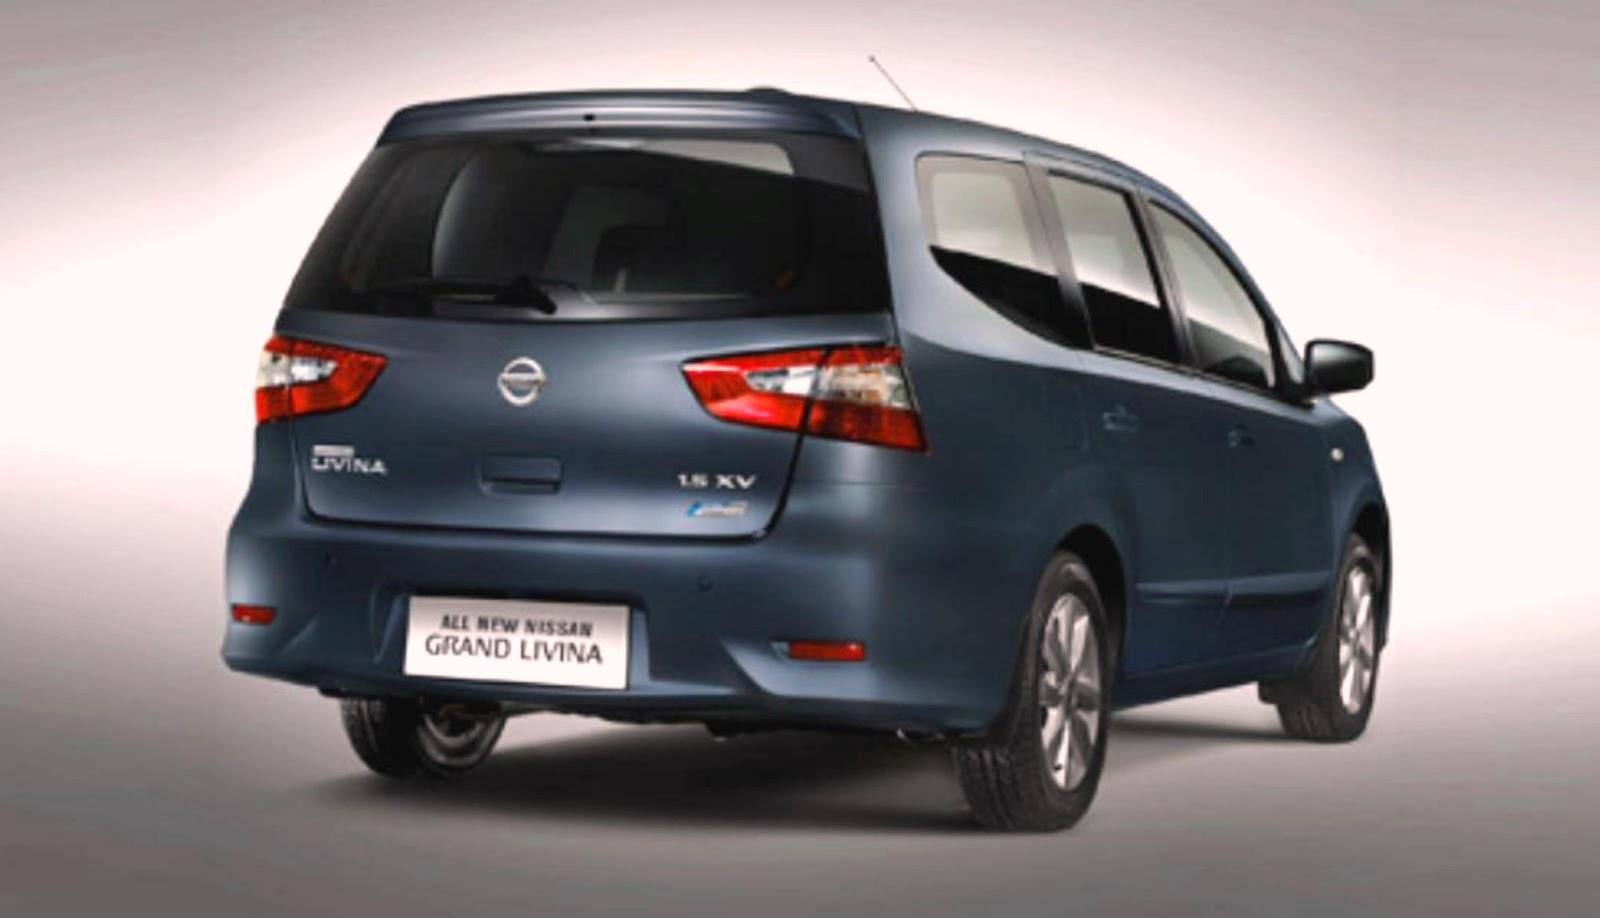 Indonesian Autocars Blogspot Com New Nissan Grand Livina 2013